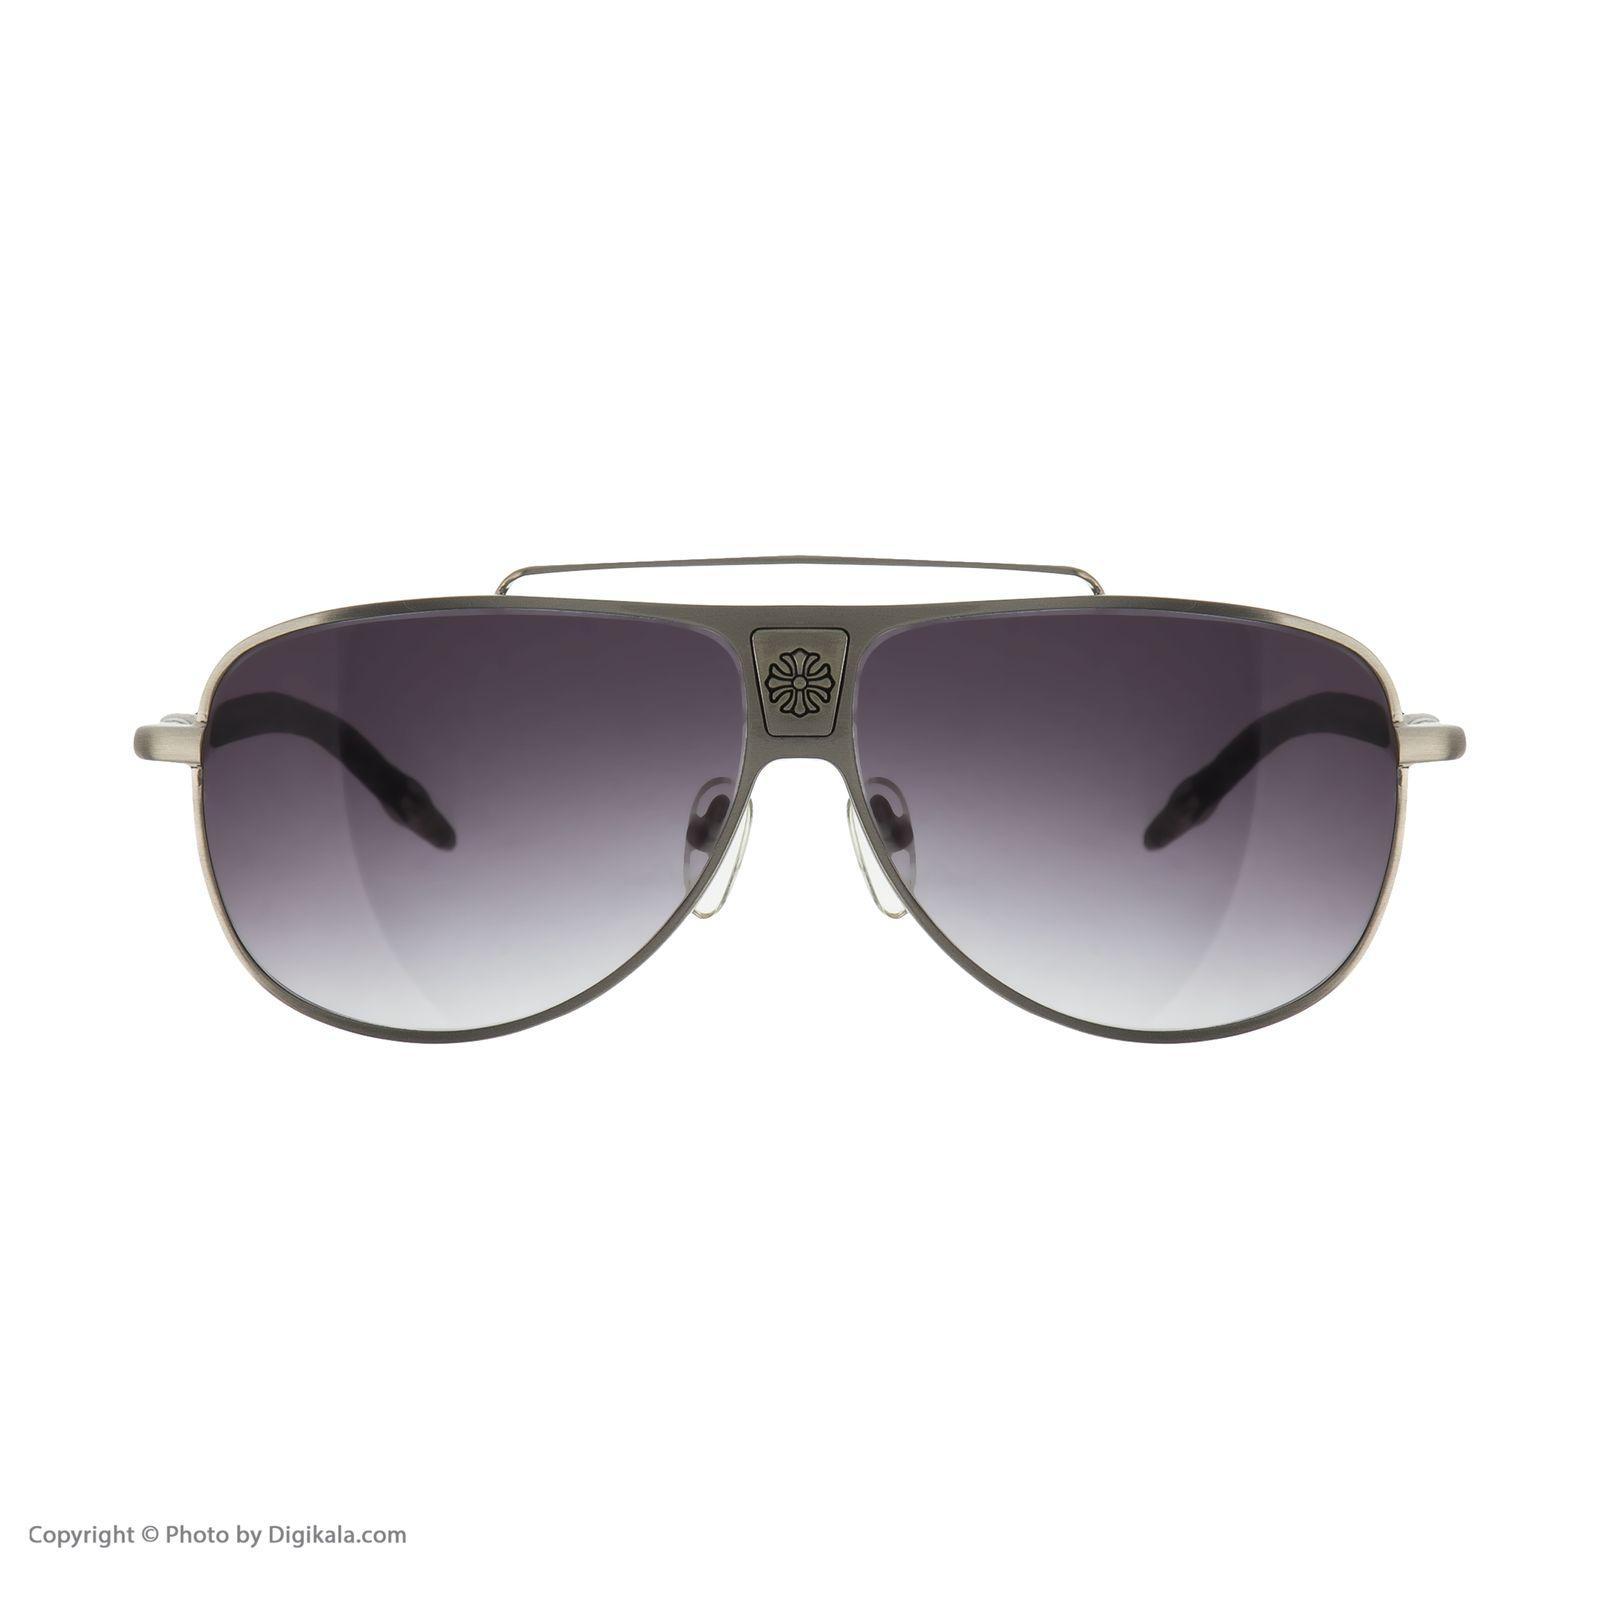 عینک آفتابی کروم هارتز مدل mine -  - 5